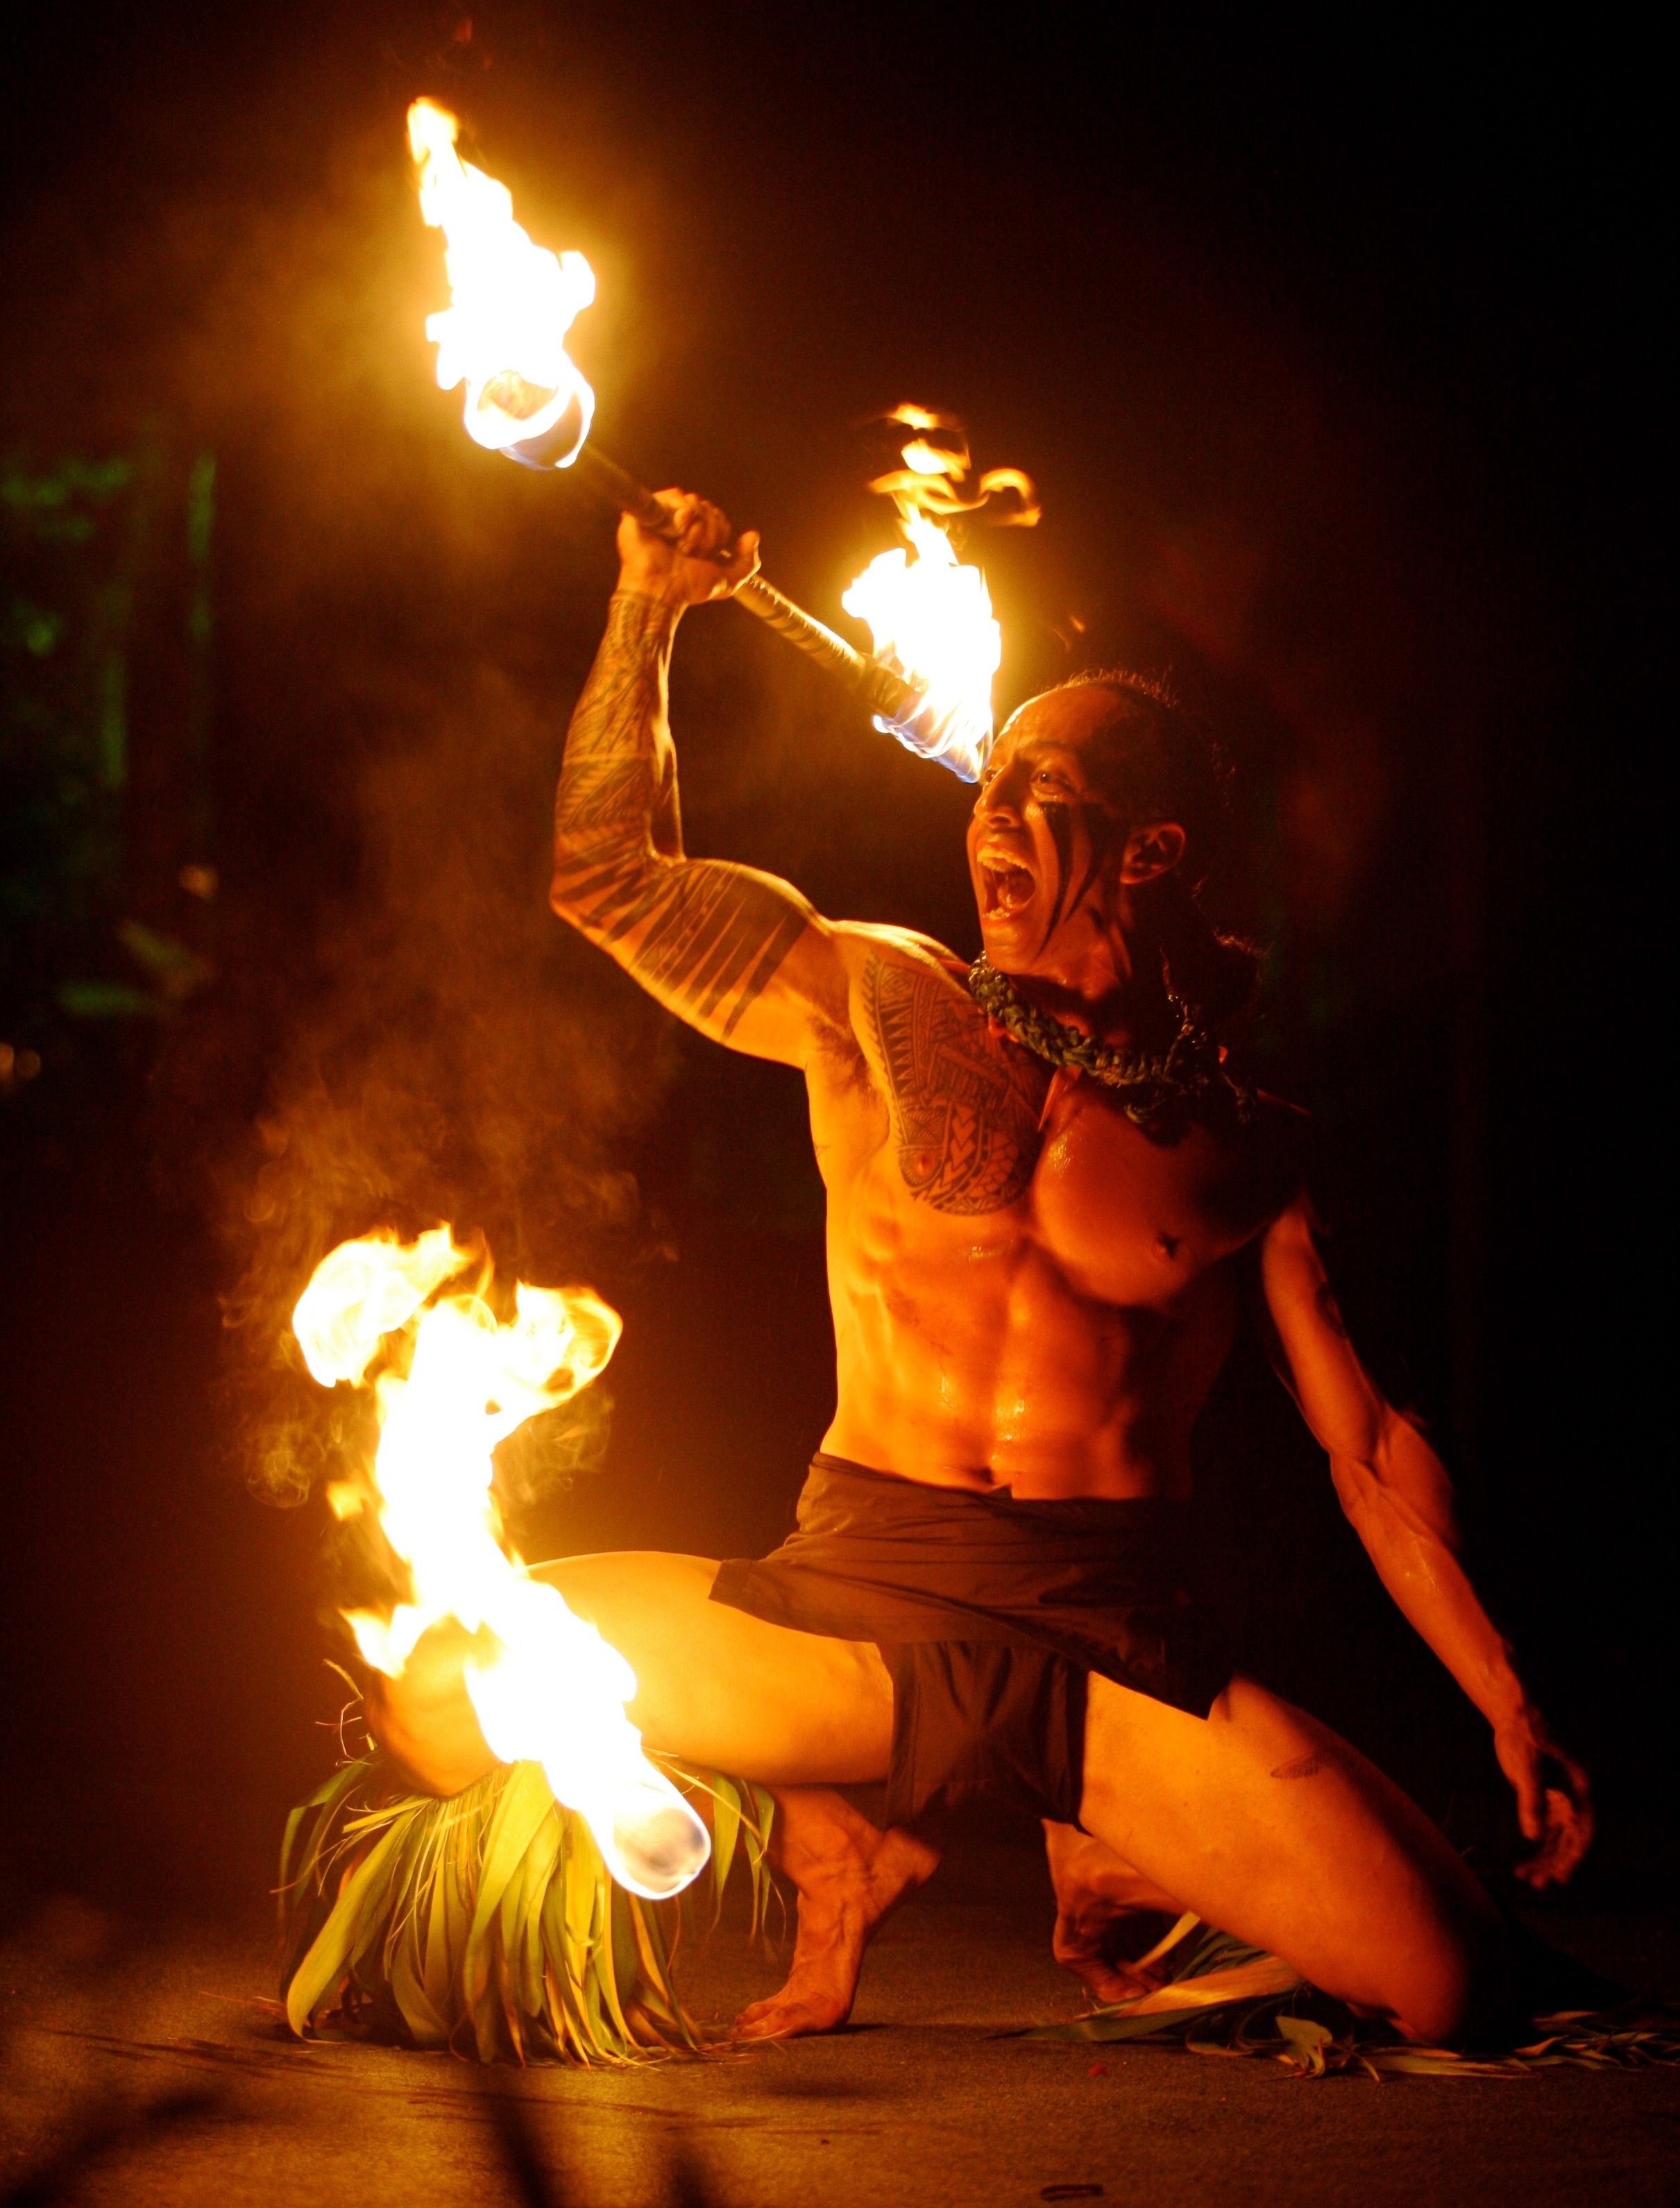 Flame Fueled Sharp Edged World Fireknife Championship Happens On Oahu This Week Fireknife Aloha Hawaii Champio Polynesian Dance Hawaii Fire Polynesian Men